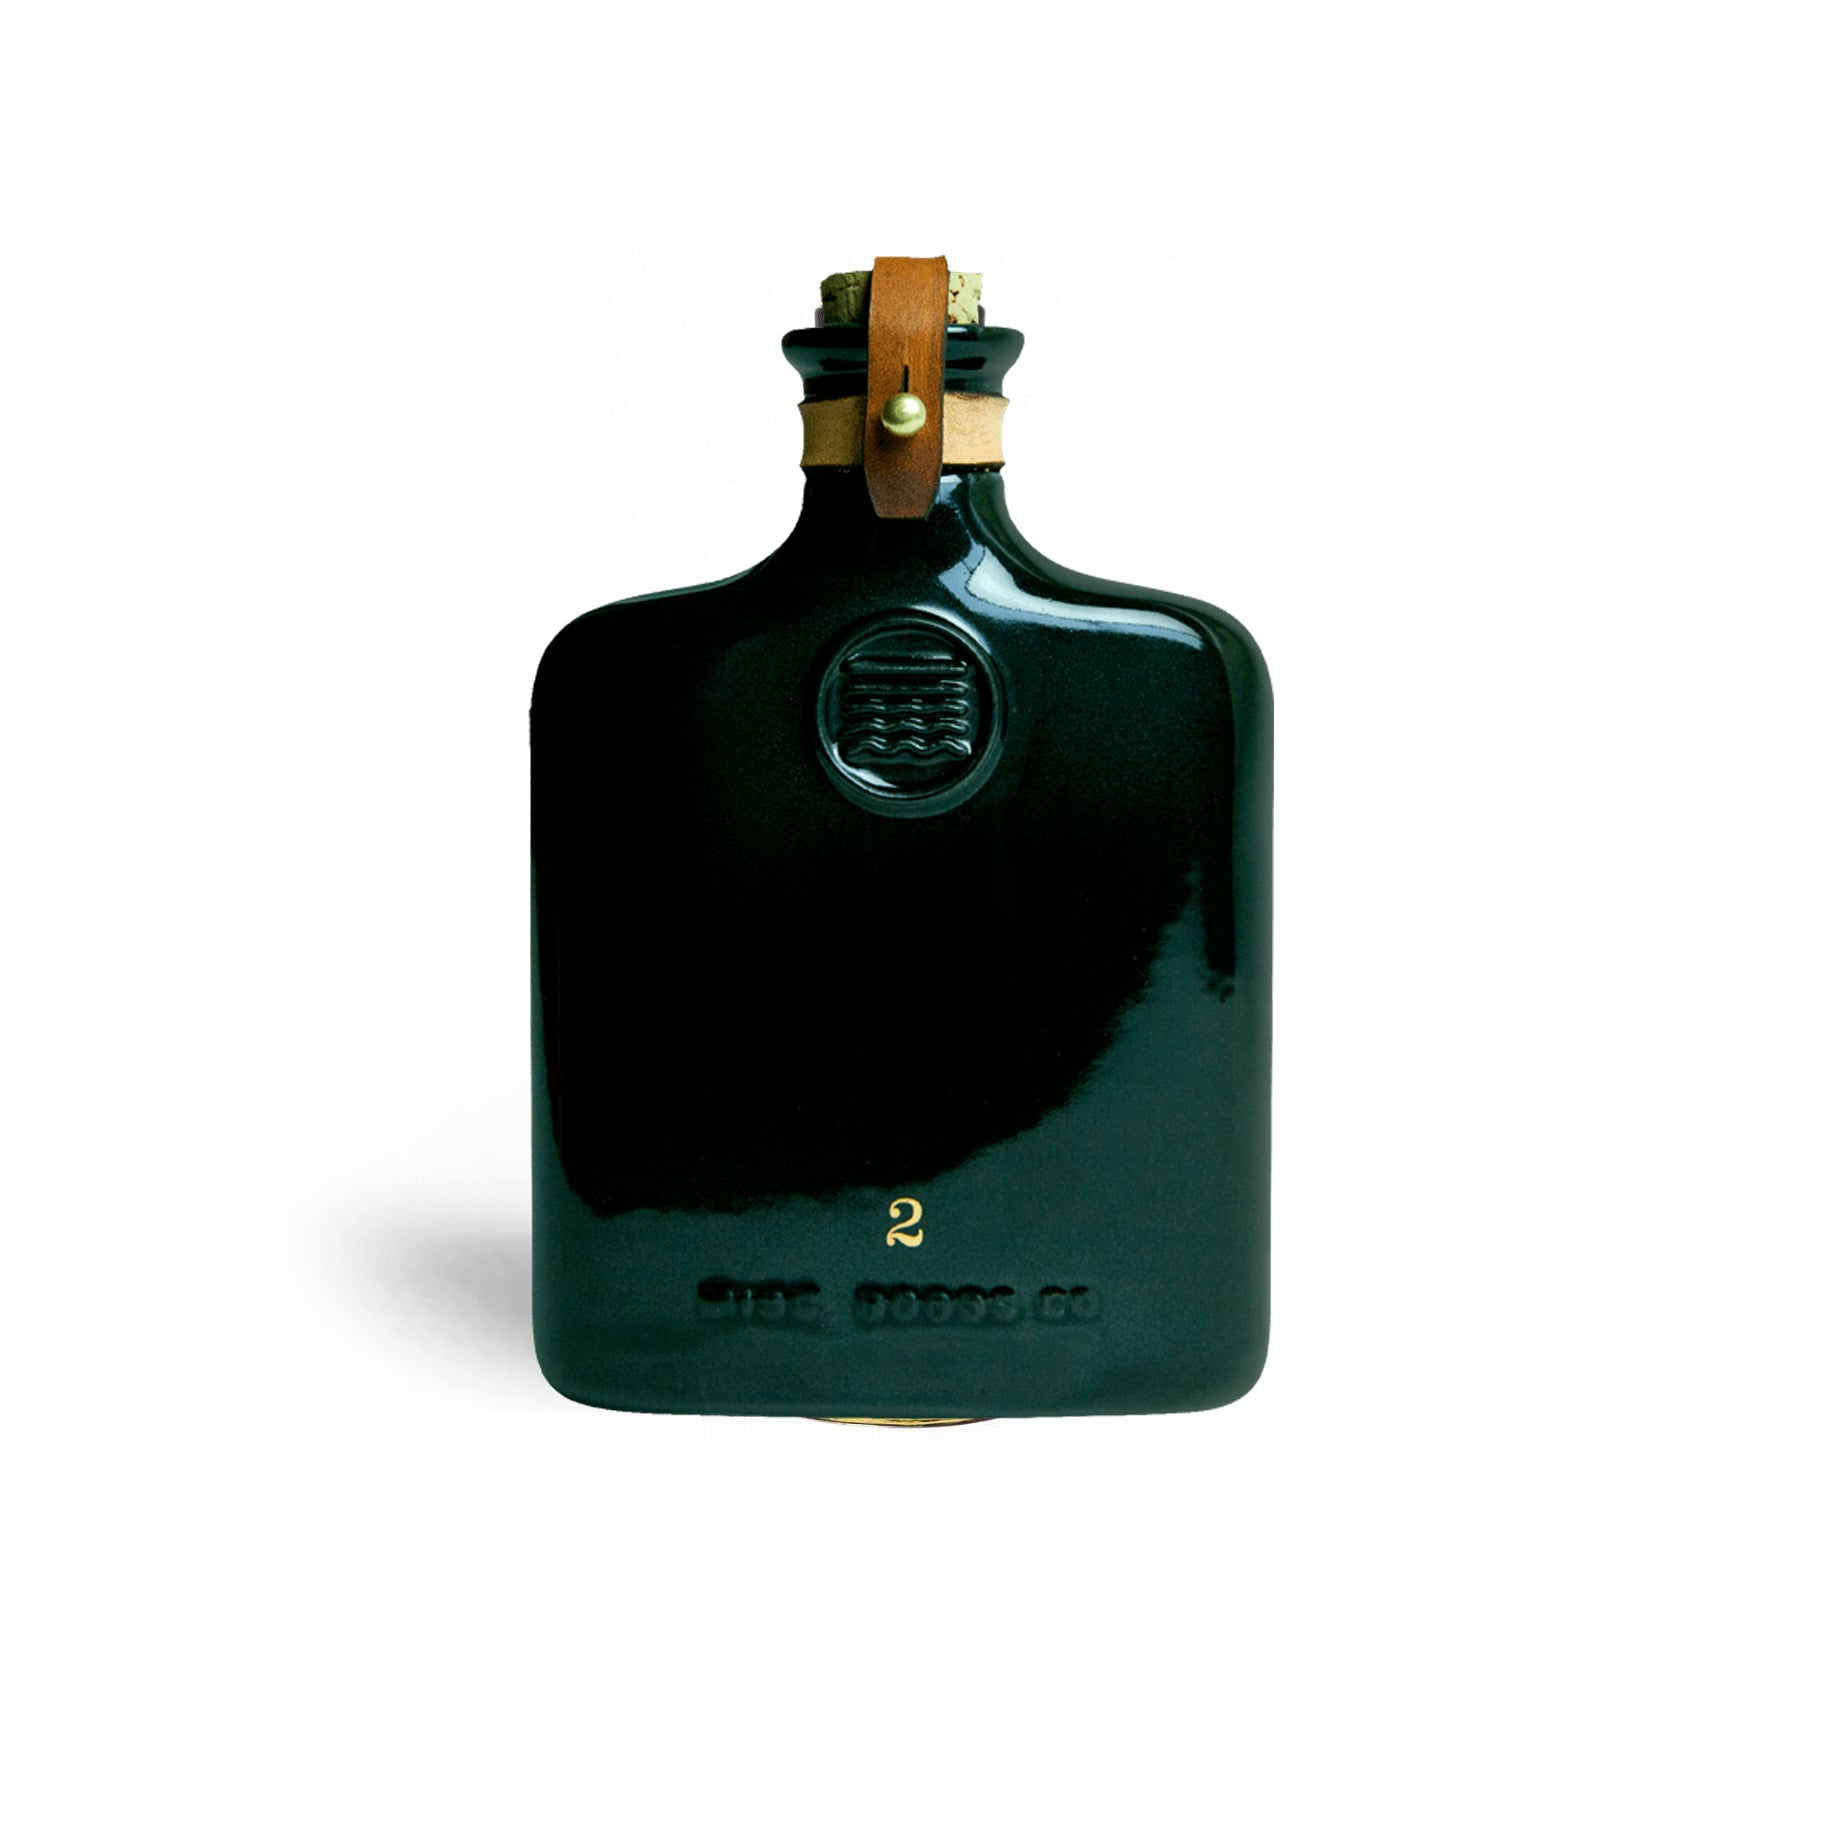 The Best Flask Option: Misc Black or Ivory Ceramic Flask